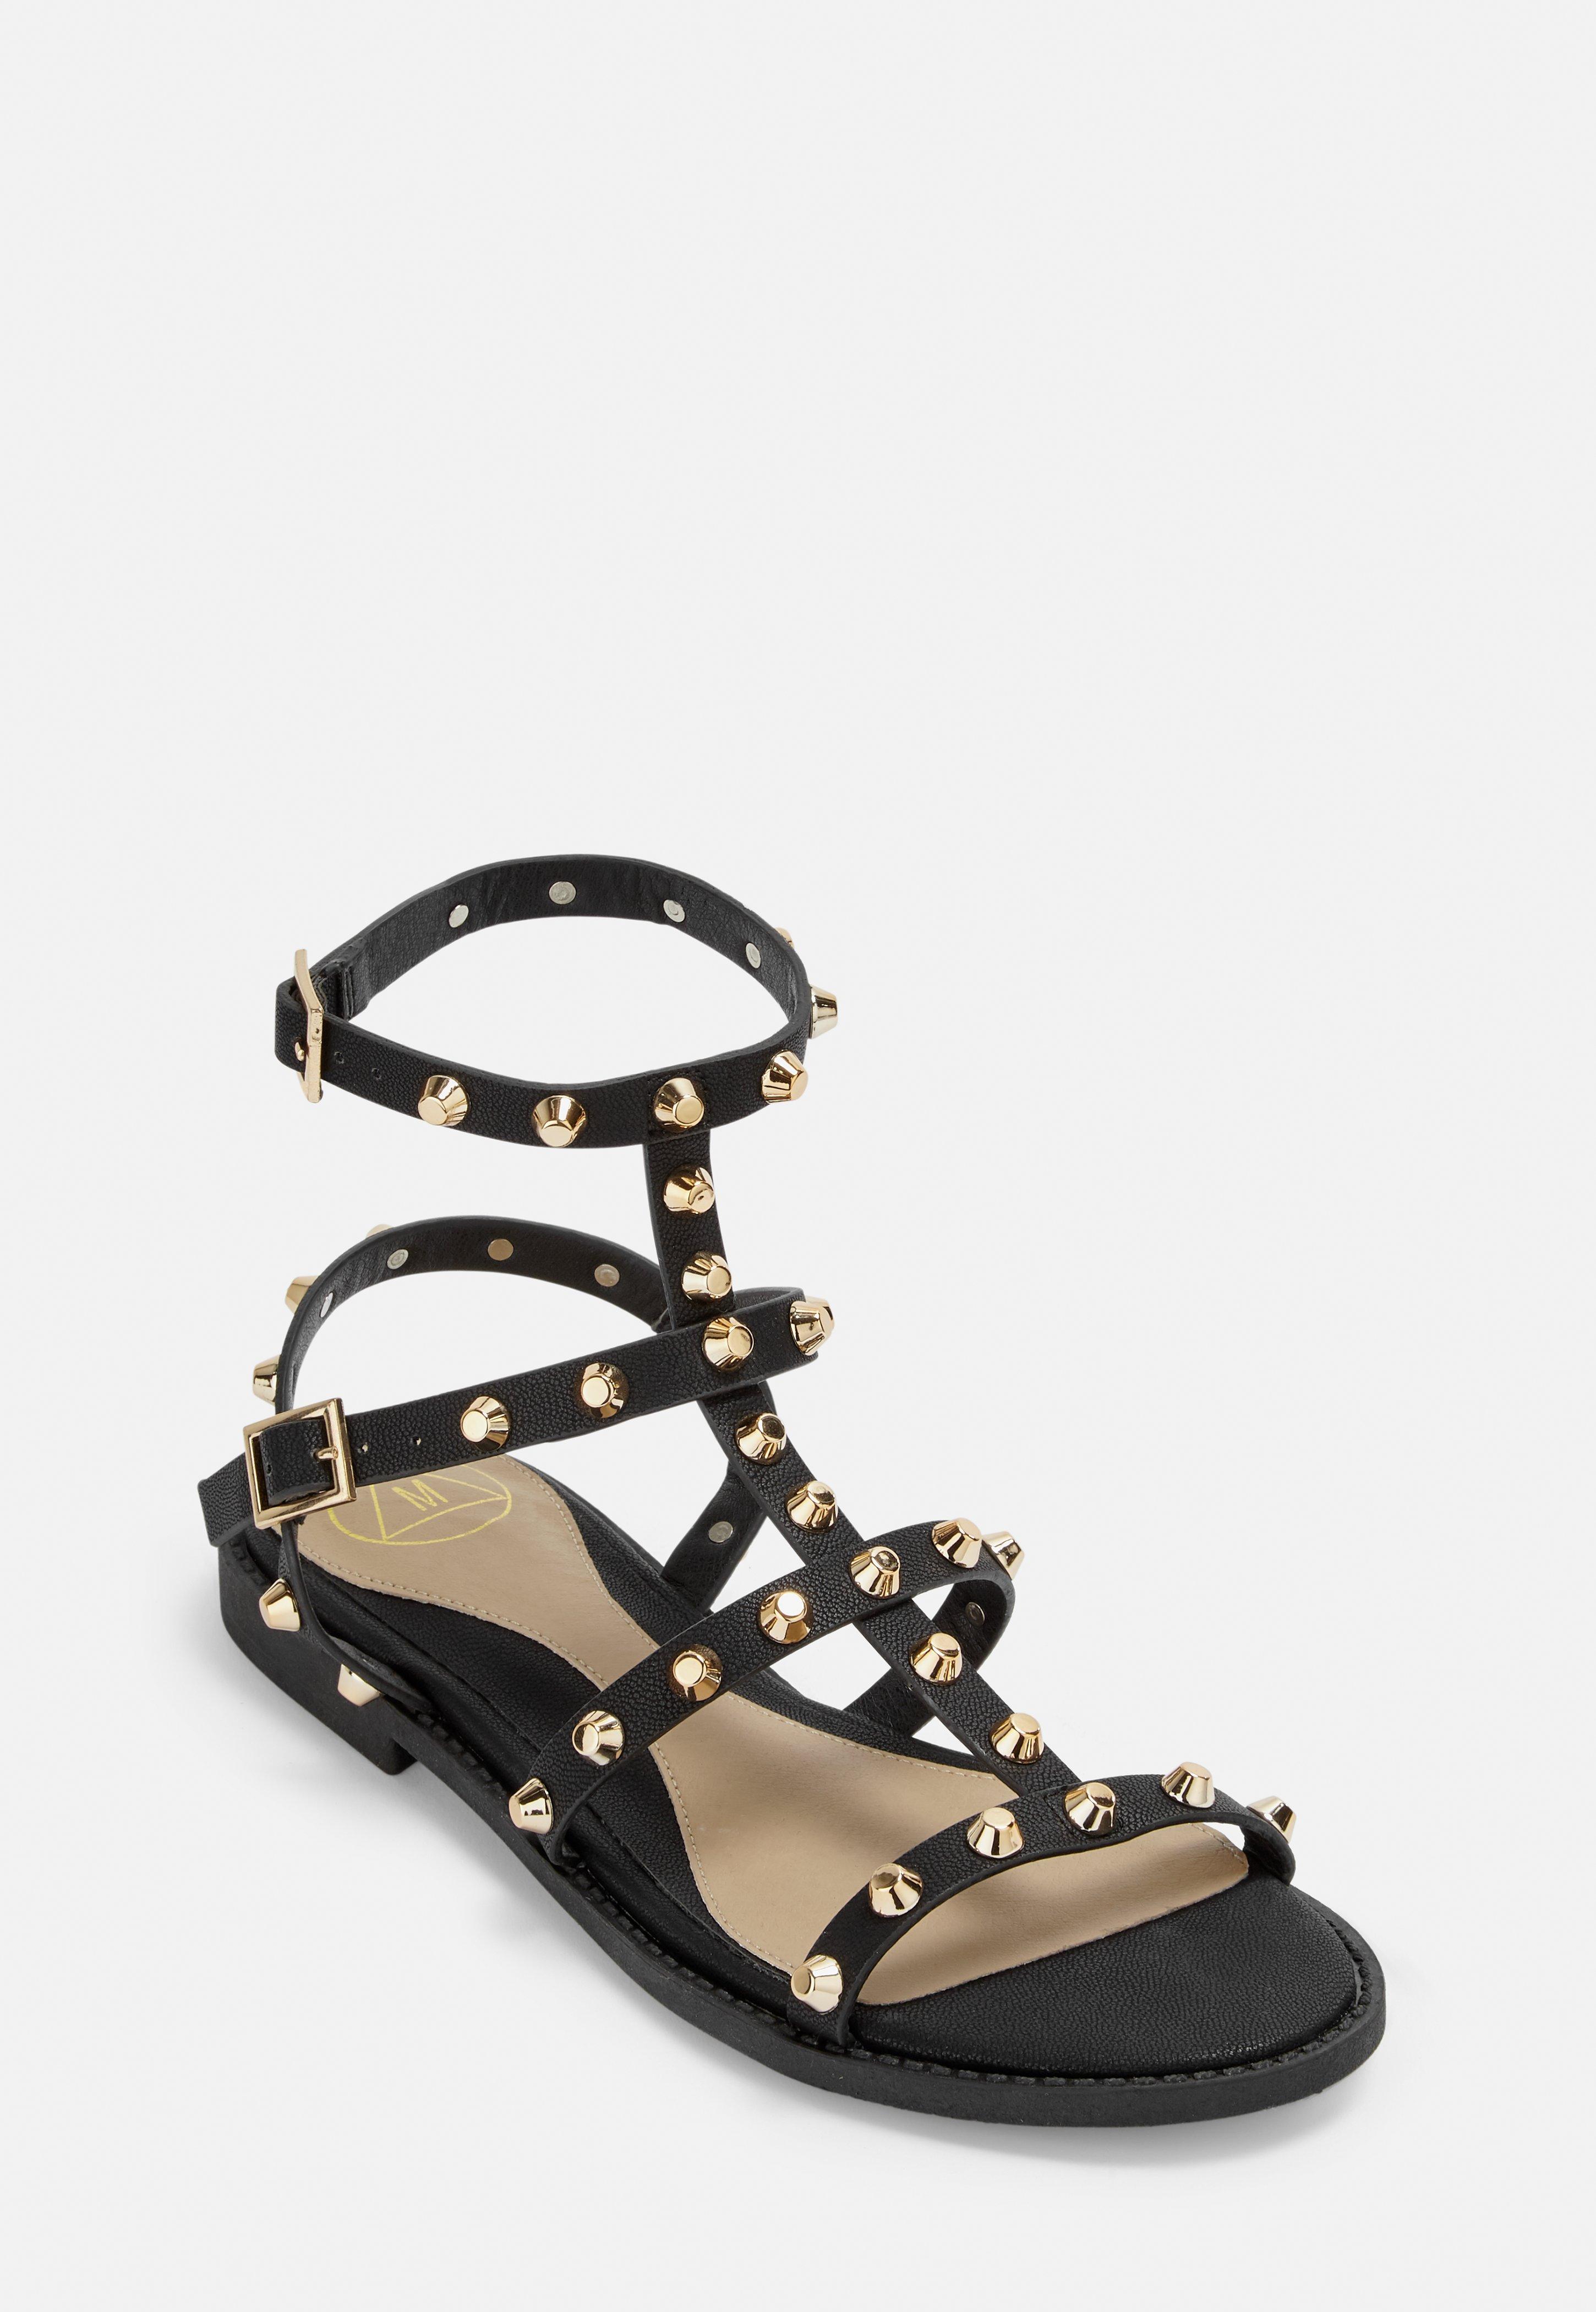 Womens Next Gladiator Stud Sandals - Silver Next yxw4k9o3c